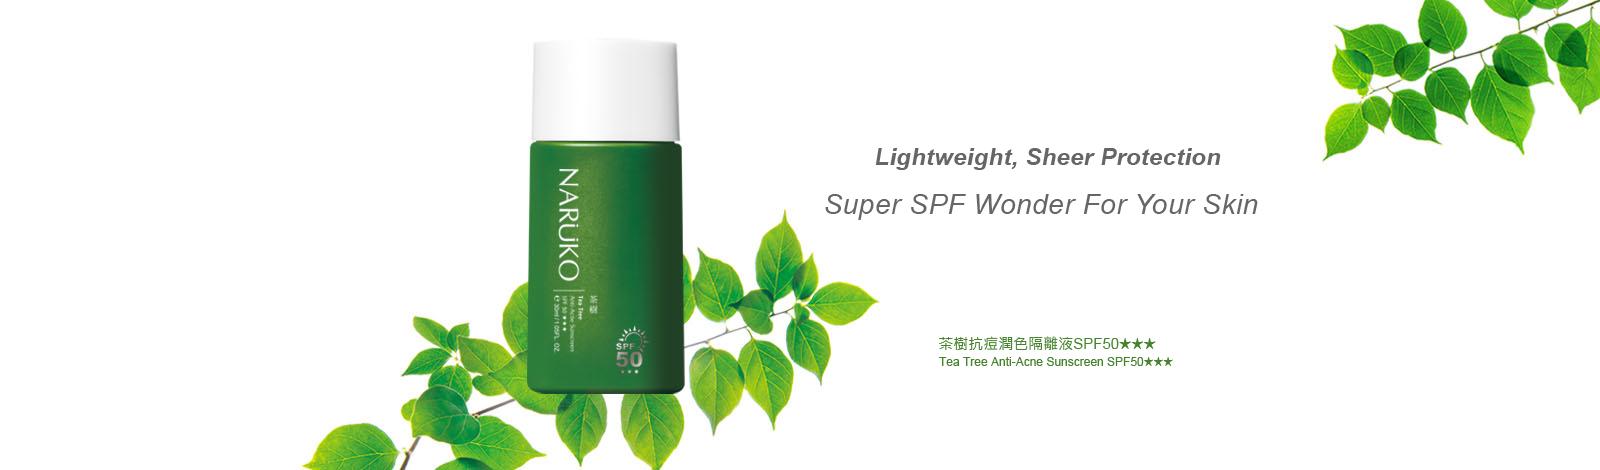 [cml_media_alt id='7044']tea-tree-anti-acne-sunscreen-spf50%c2%b9%c2%b9%c2%b9-01[/cml_media_alt]